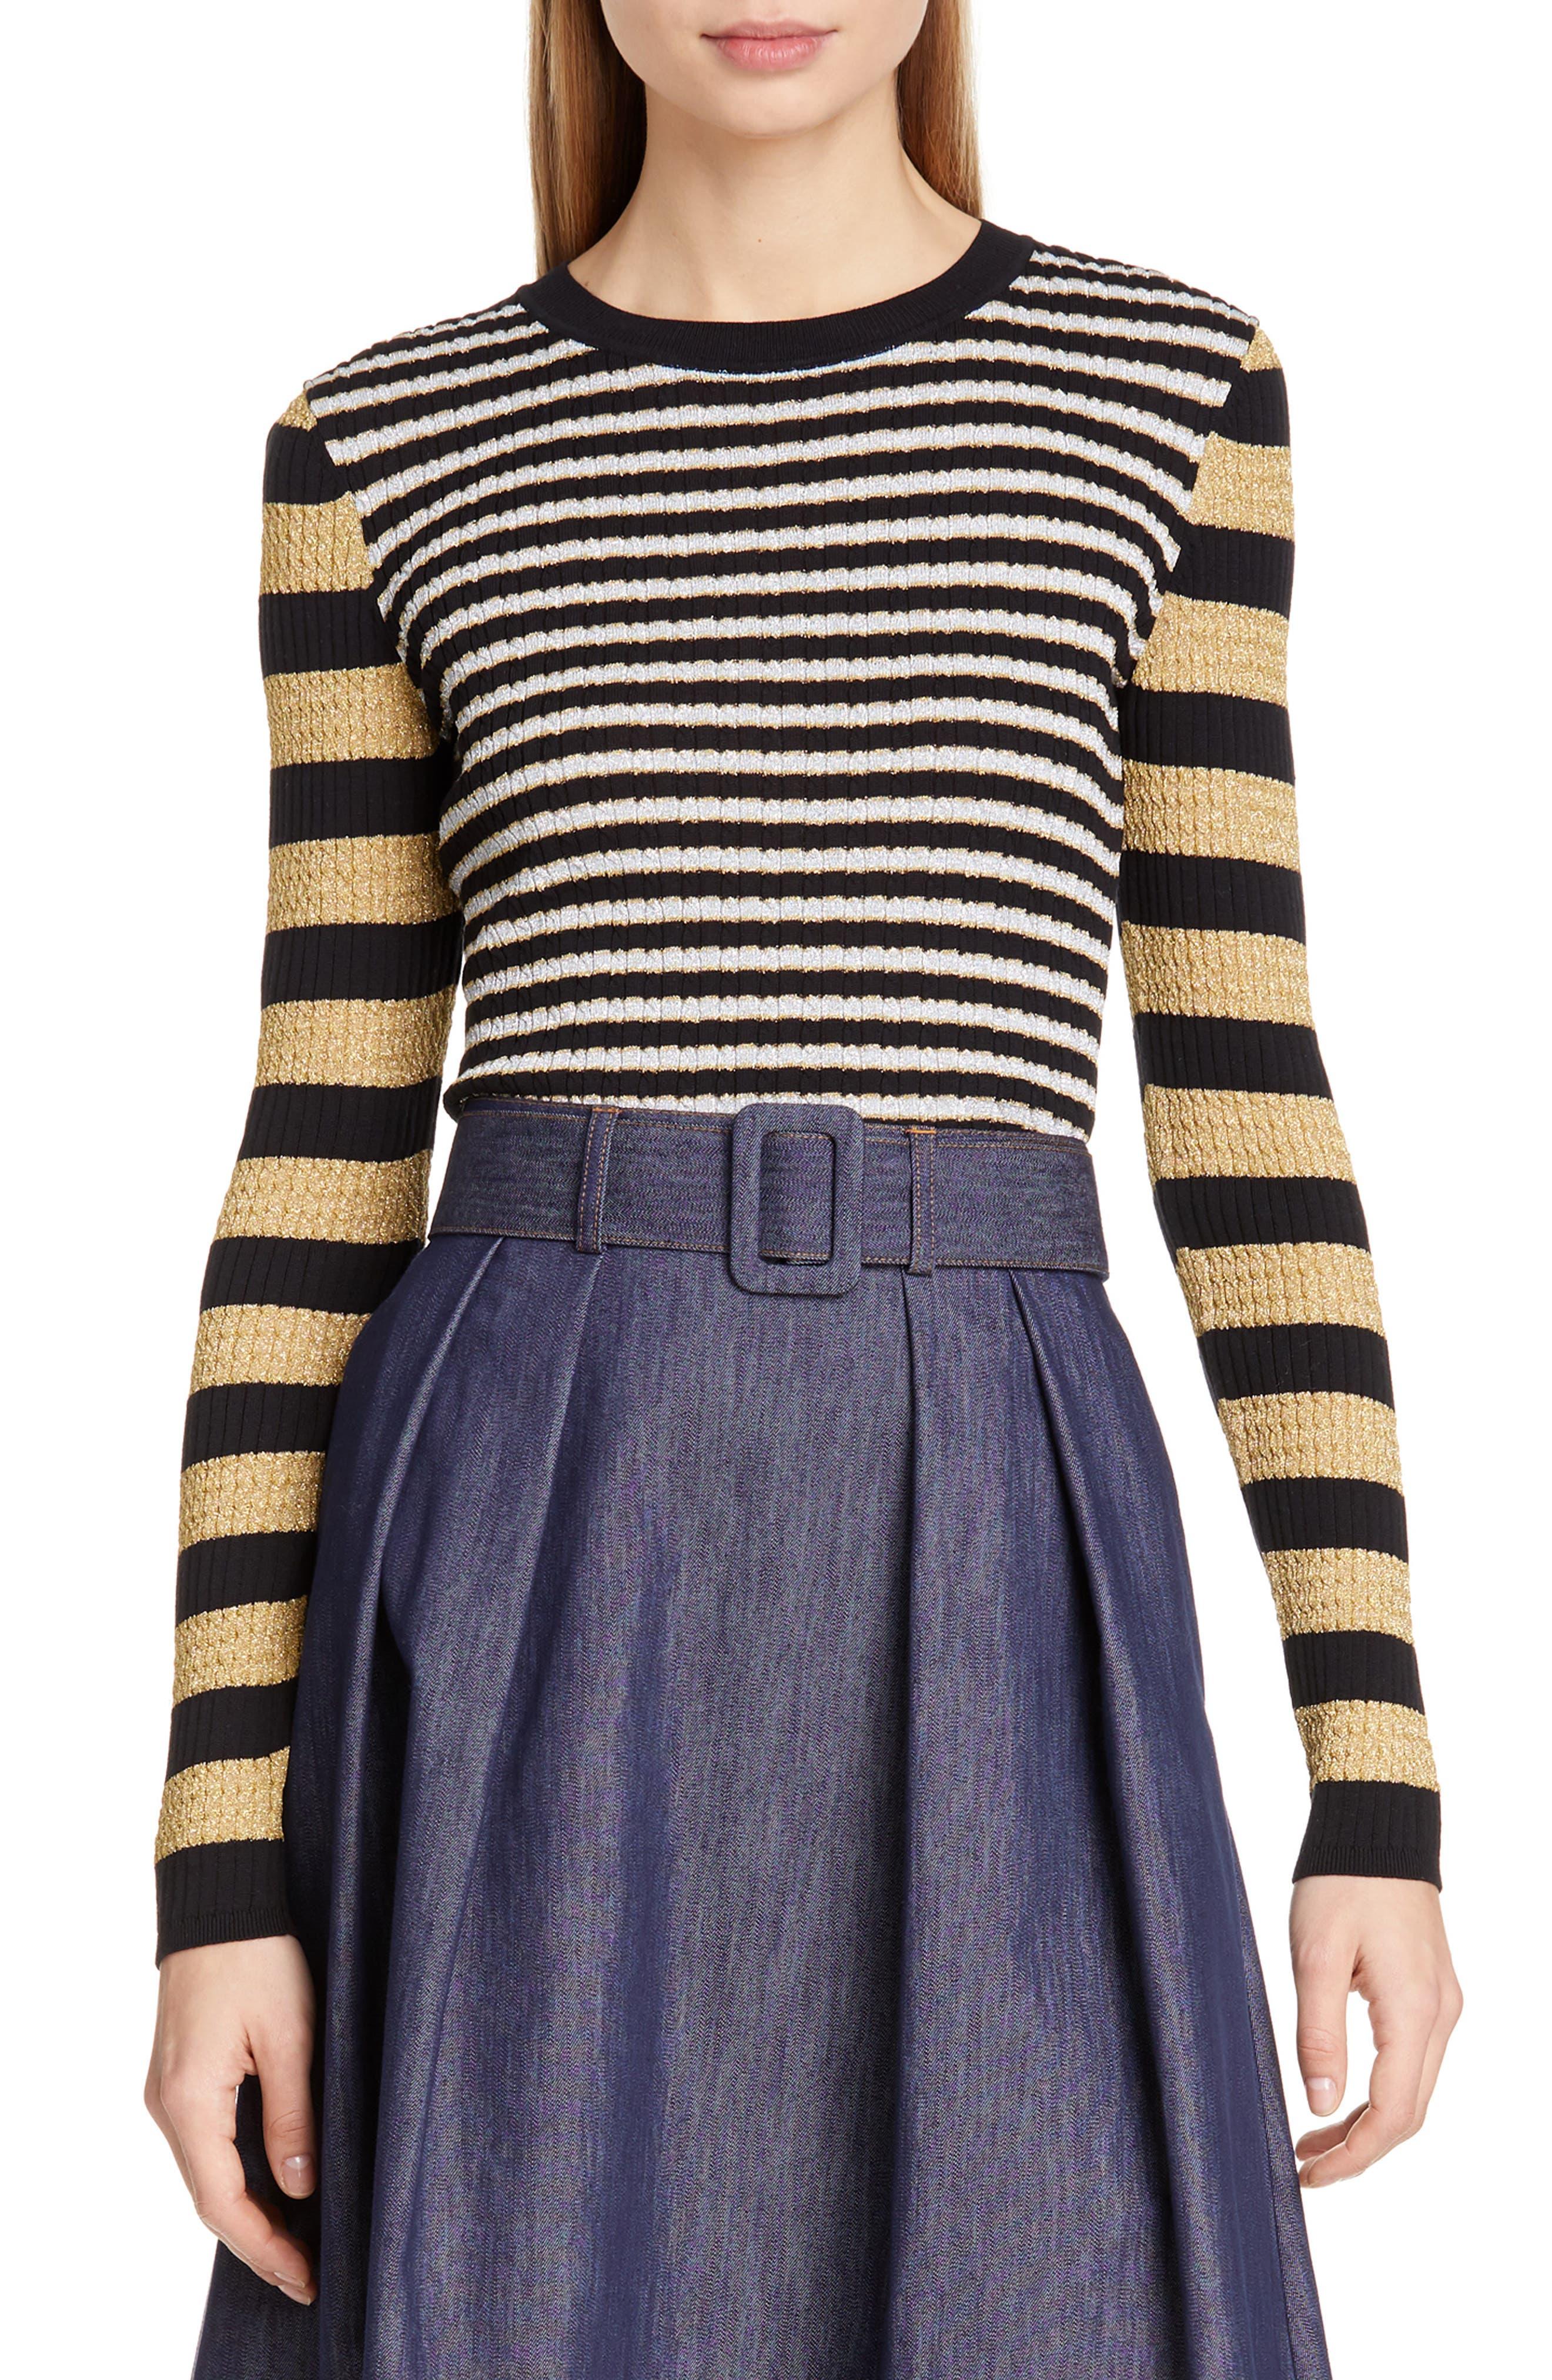 TOMMY X ZENDAYA, Metallic Stripe Knit Top, Main thumbnail 1, color, BLACK BEAUTY MULTI